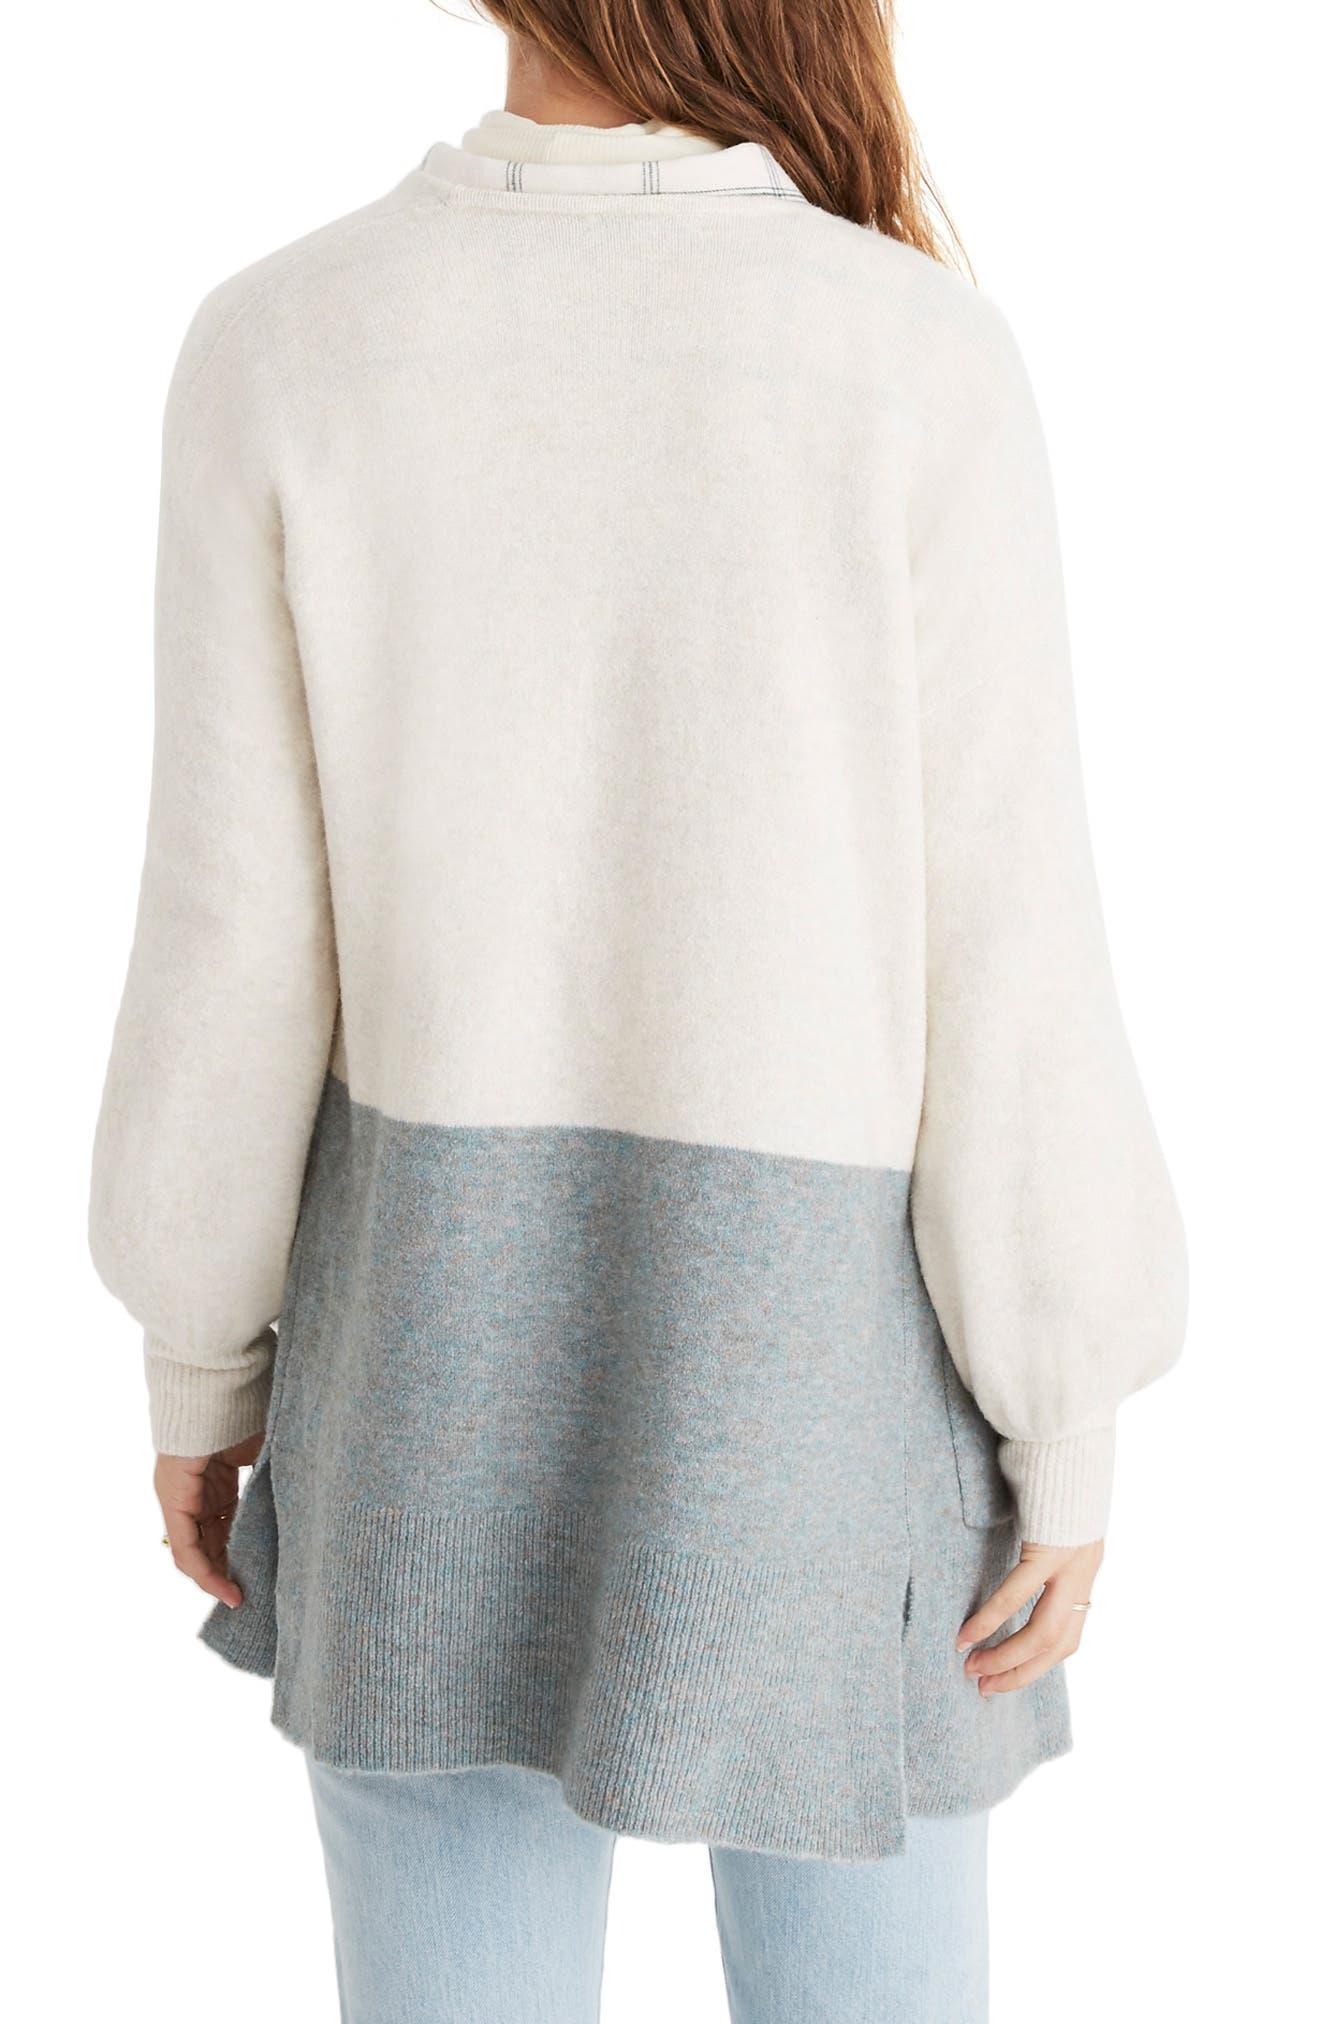 Kent Colorblock Cardigan Sweater,                             Alternate thumbnail 2, color,                             HEATHER RIVER